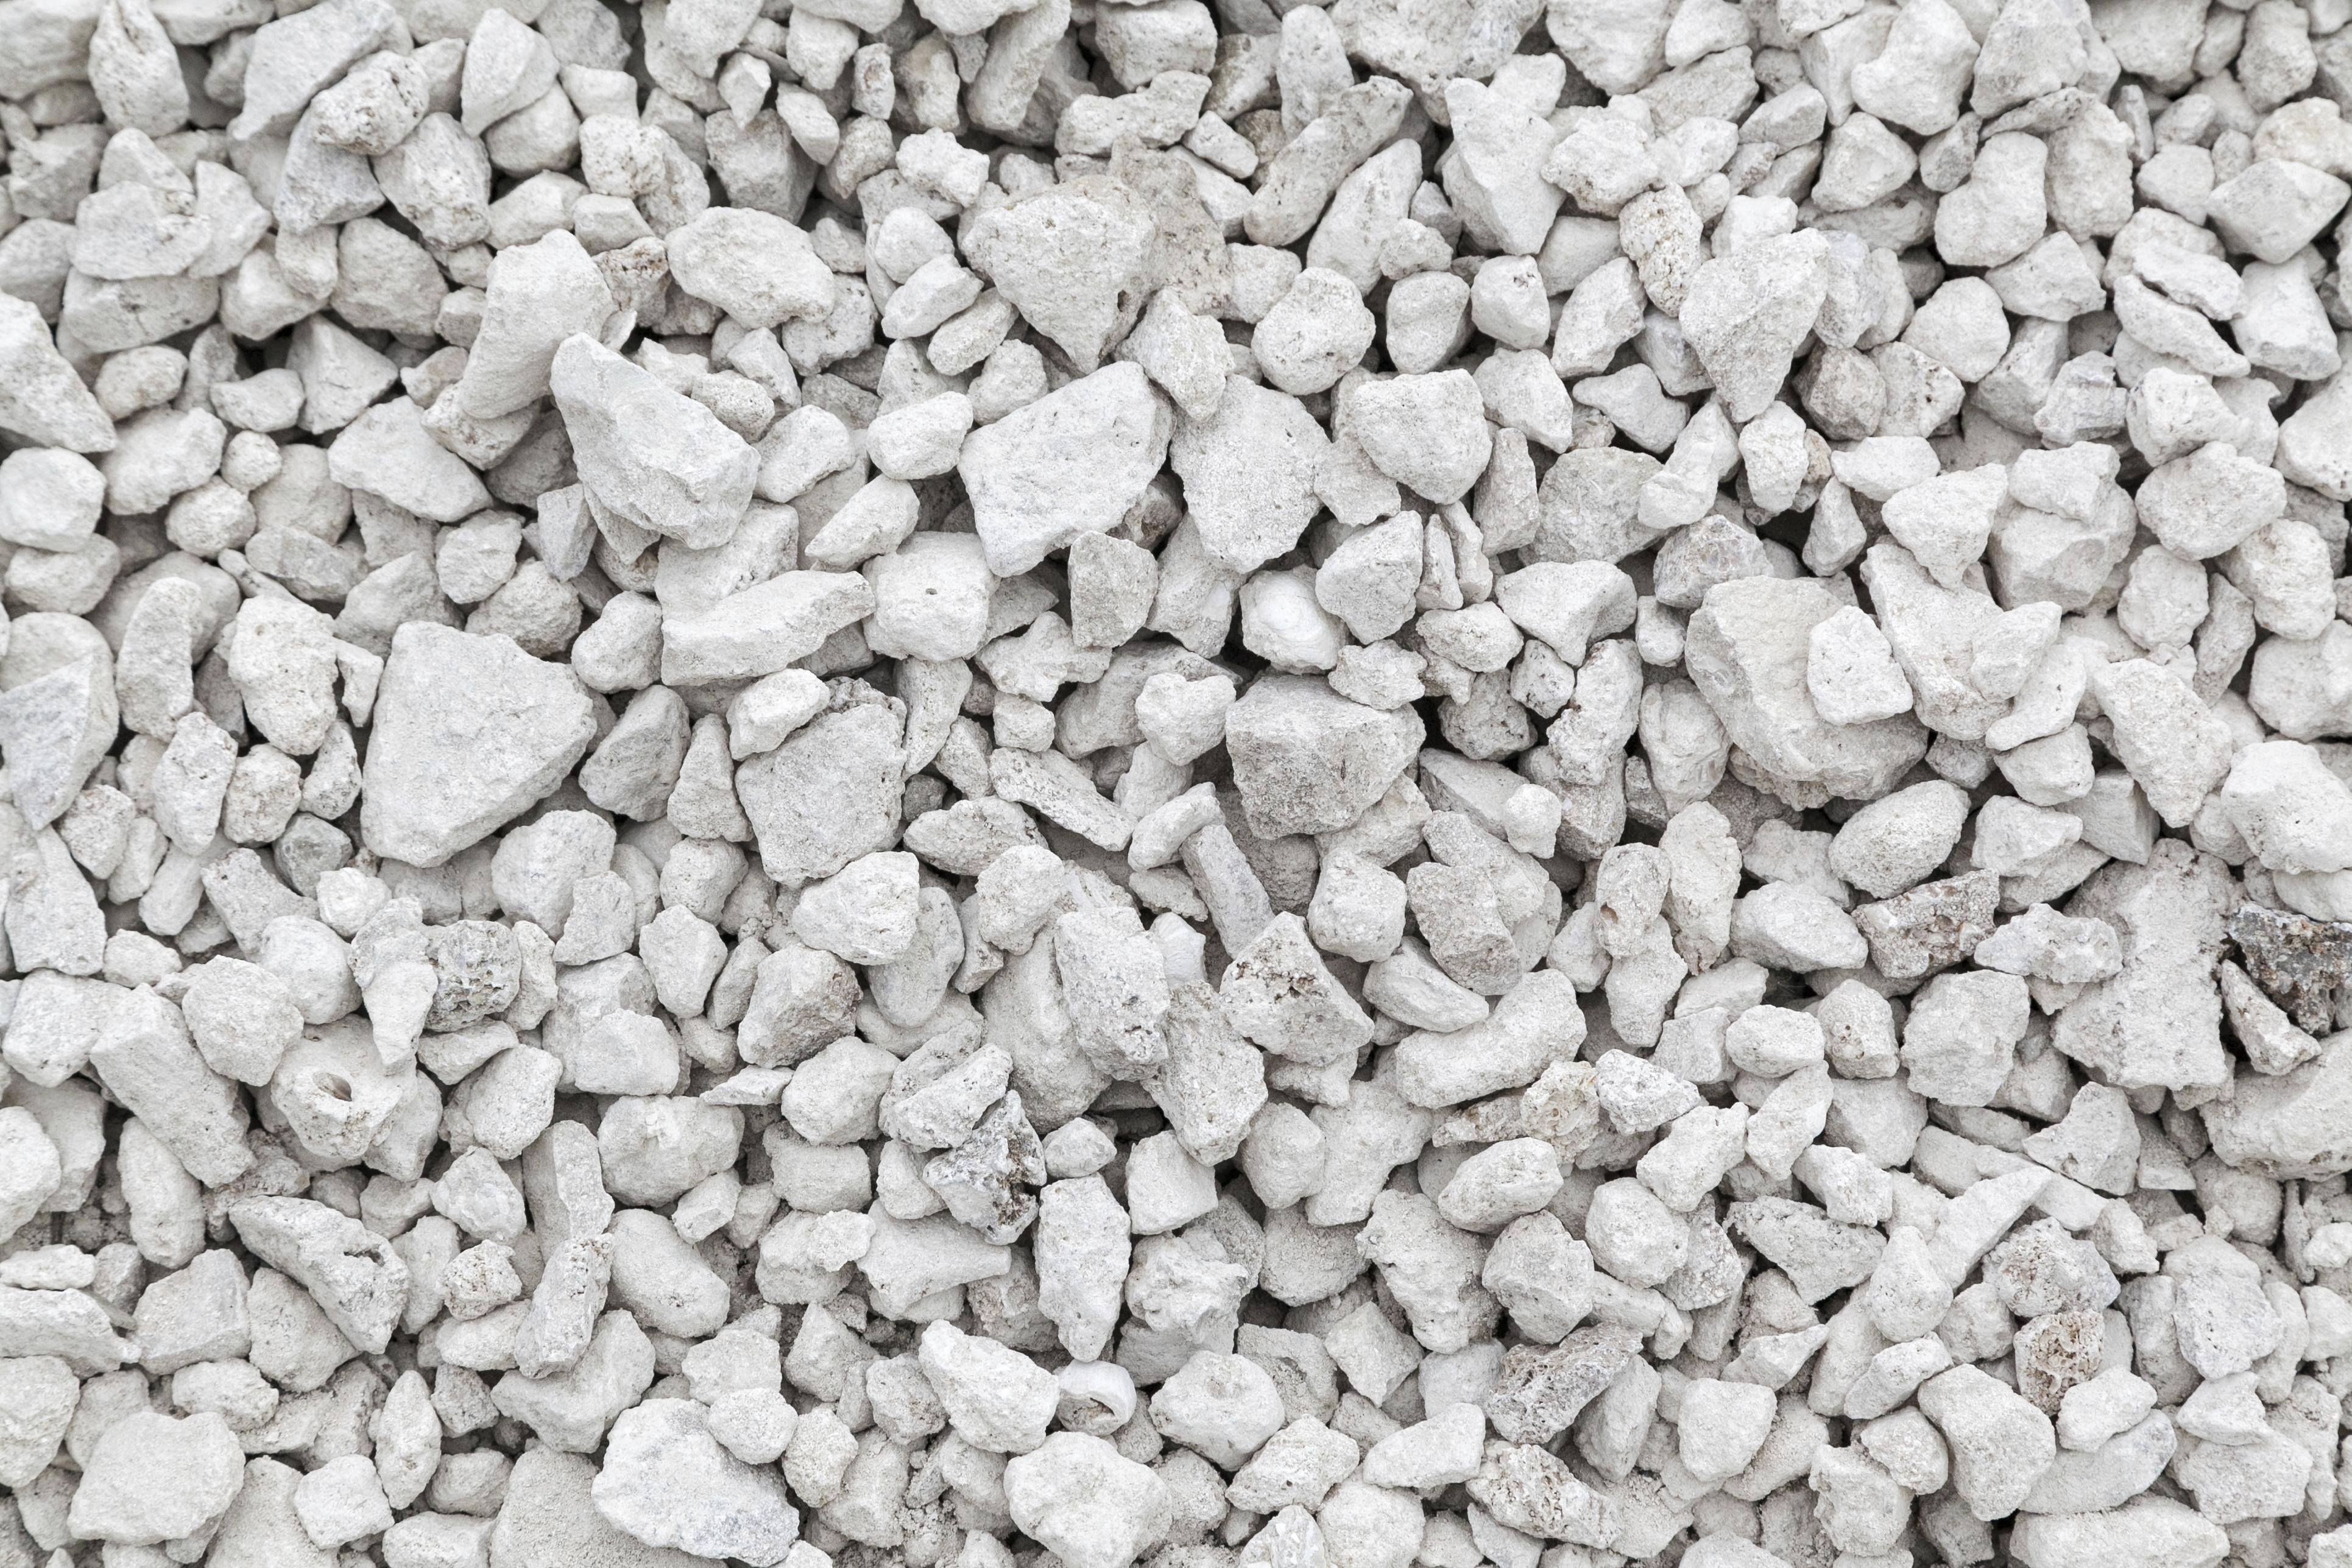 Why Does Vinegar Affect Limestone?